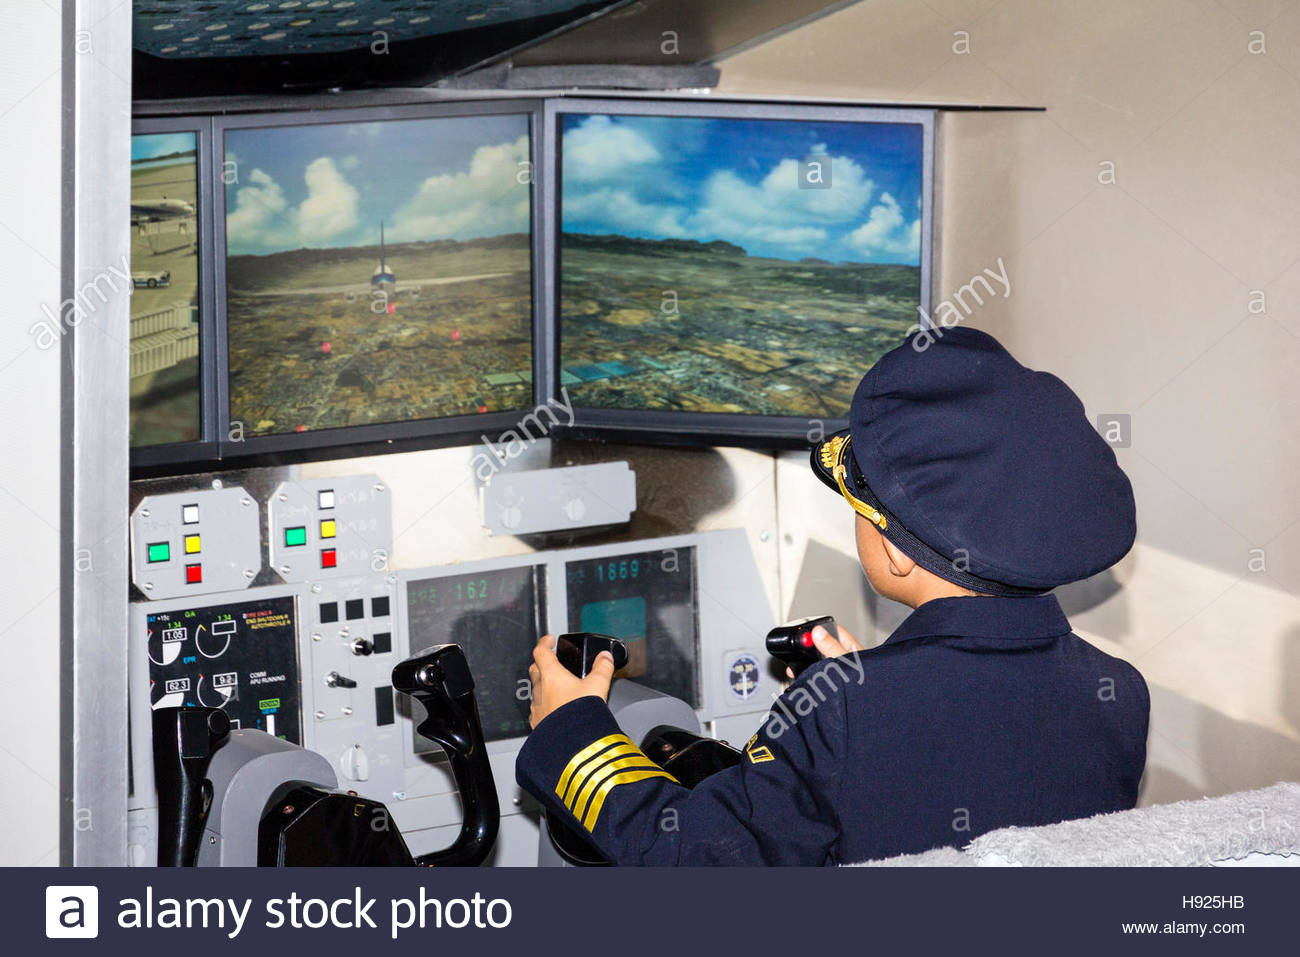 Click image for larger version.  Name:japan-nishinomiya-kidzania-ana-flight-simulators-with-boy-child-in-H925HB.jpg Views:28 Size:151.8 KB ID:25492